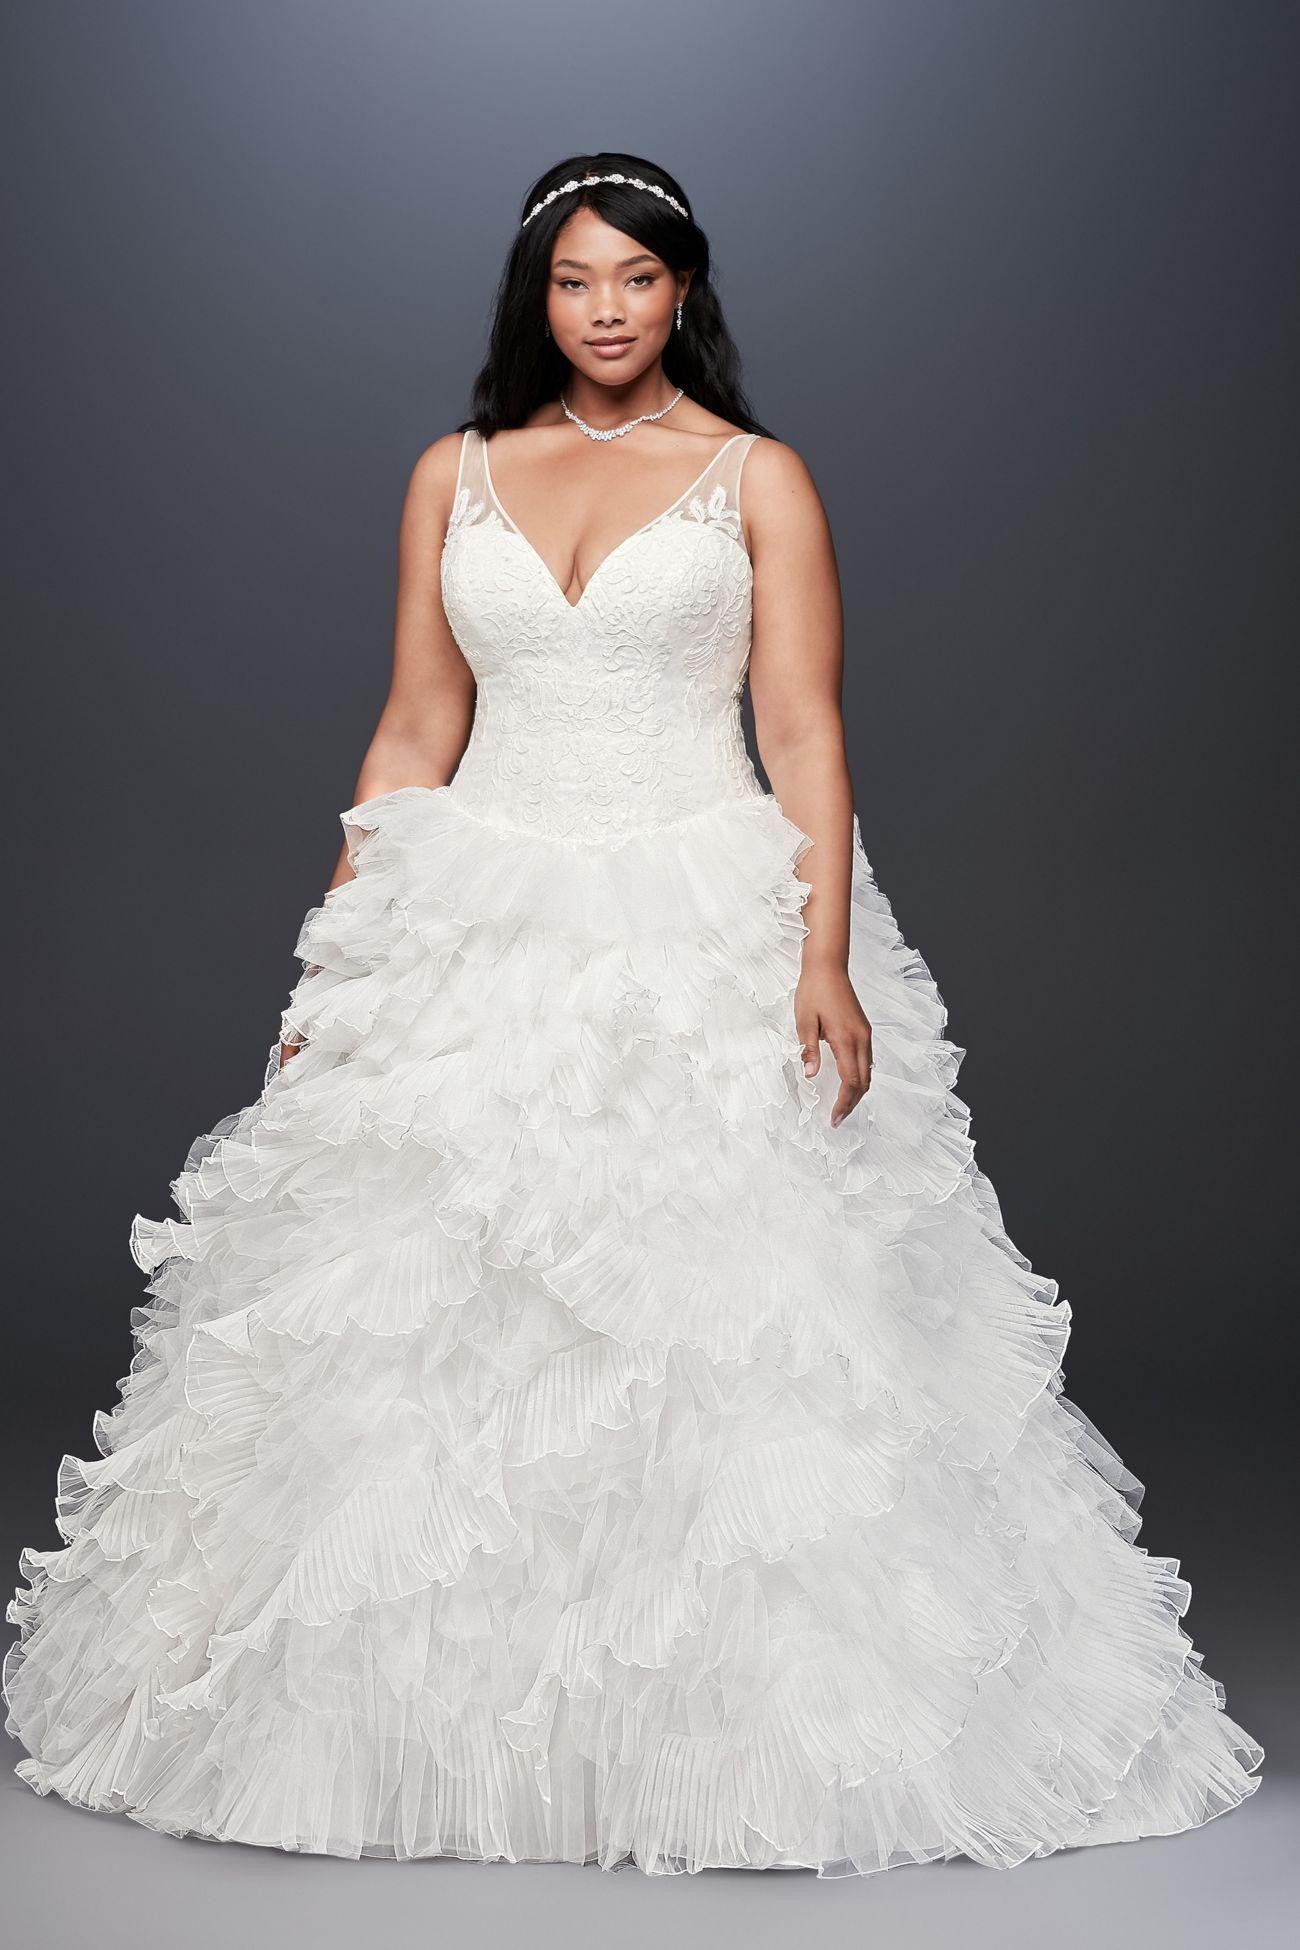 Plus size wedding dress designers  SWG  Weddings  Pinterest  Wedding dresses Wedding and Plus